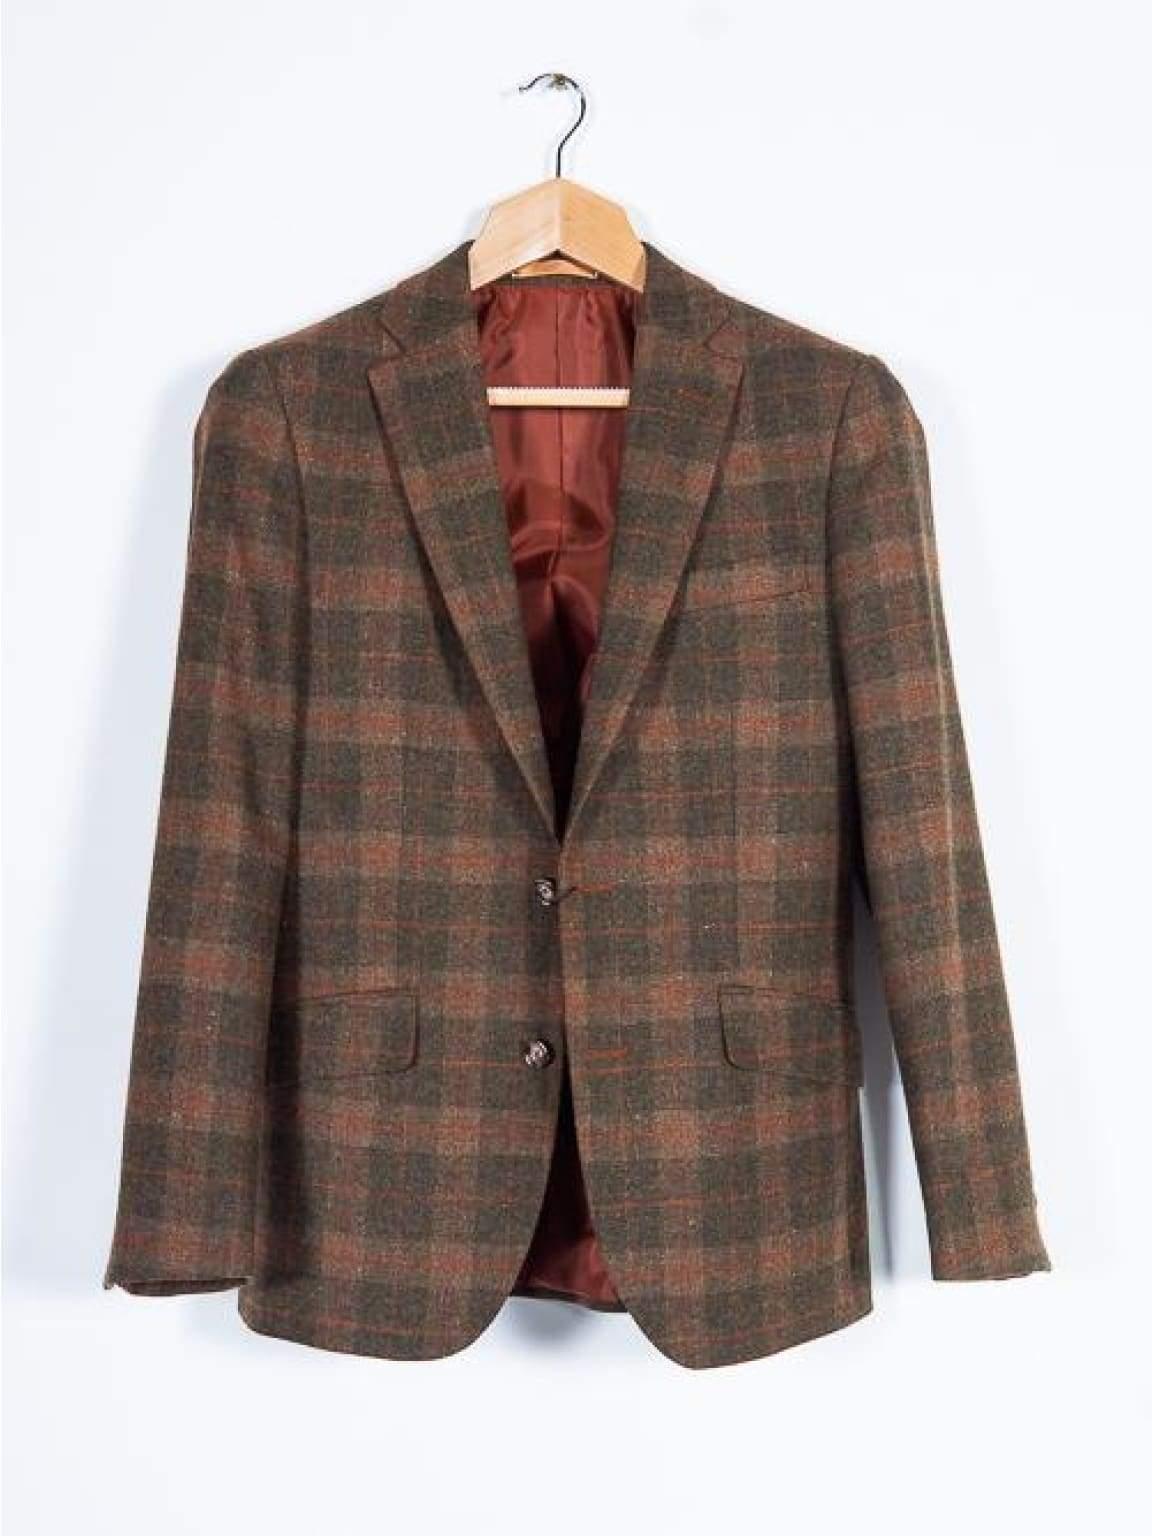 Brown Tweed Blazer 100% Wool Tailored Fit by Torre - 34 - Suit & Tailoring